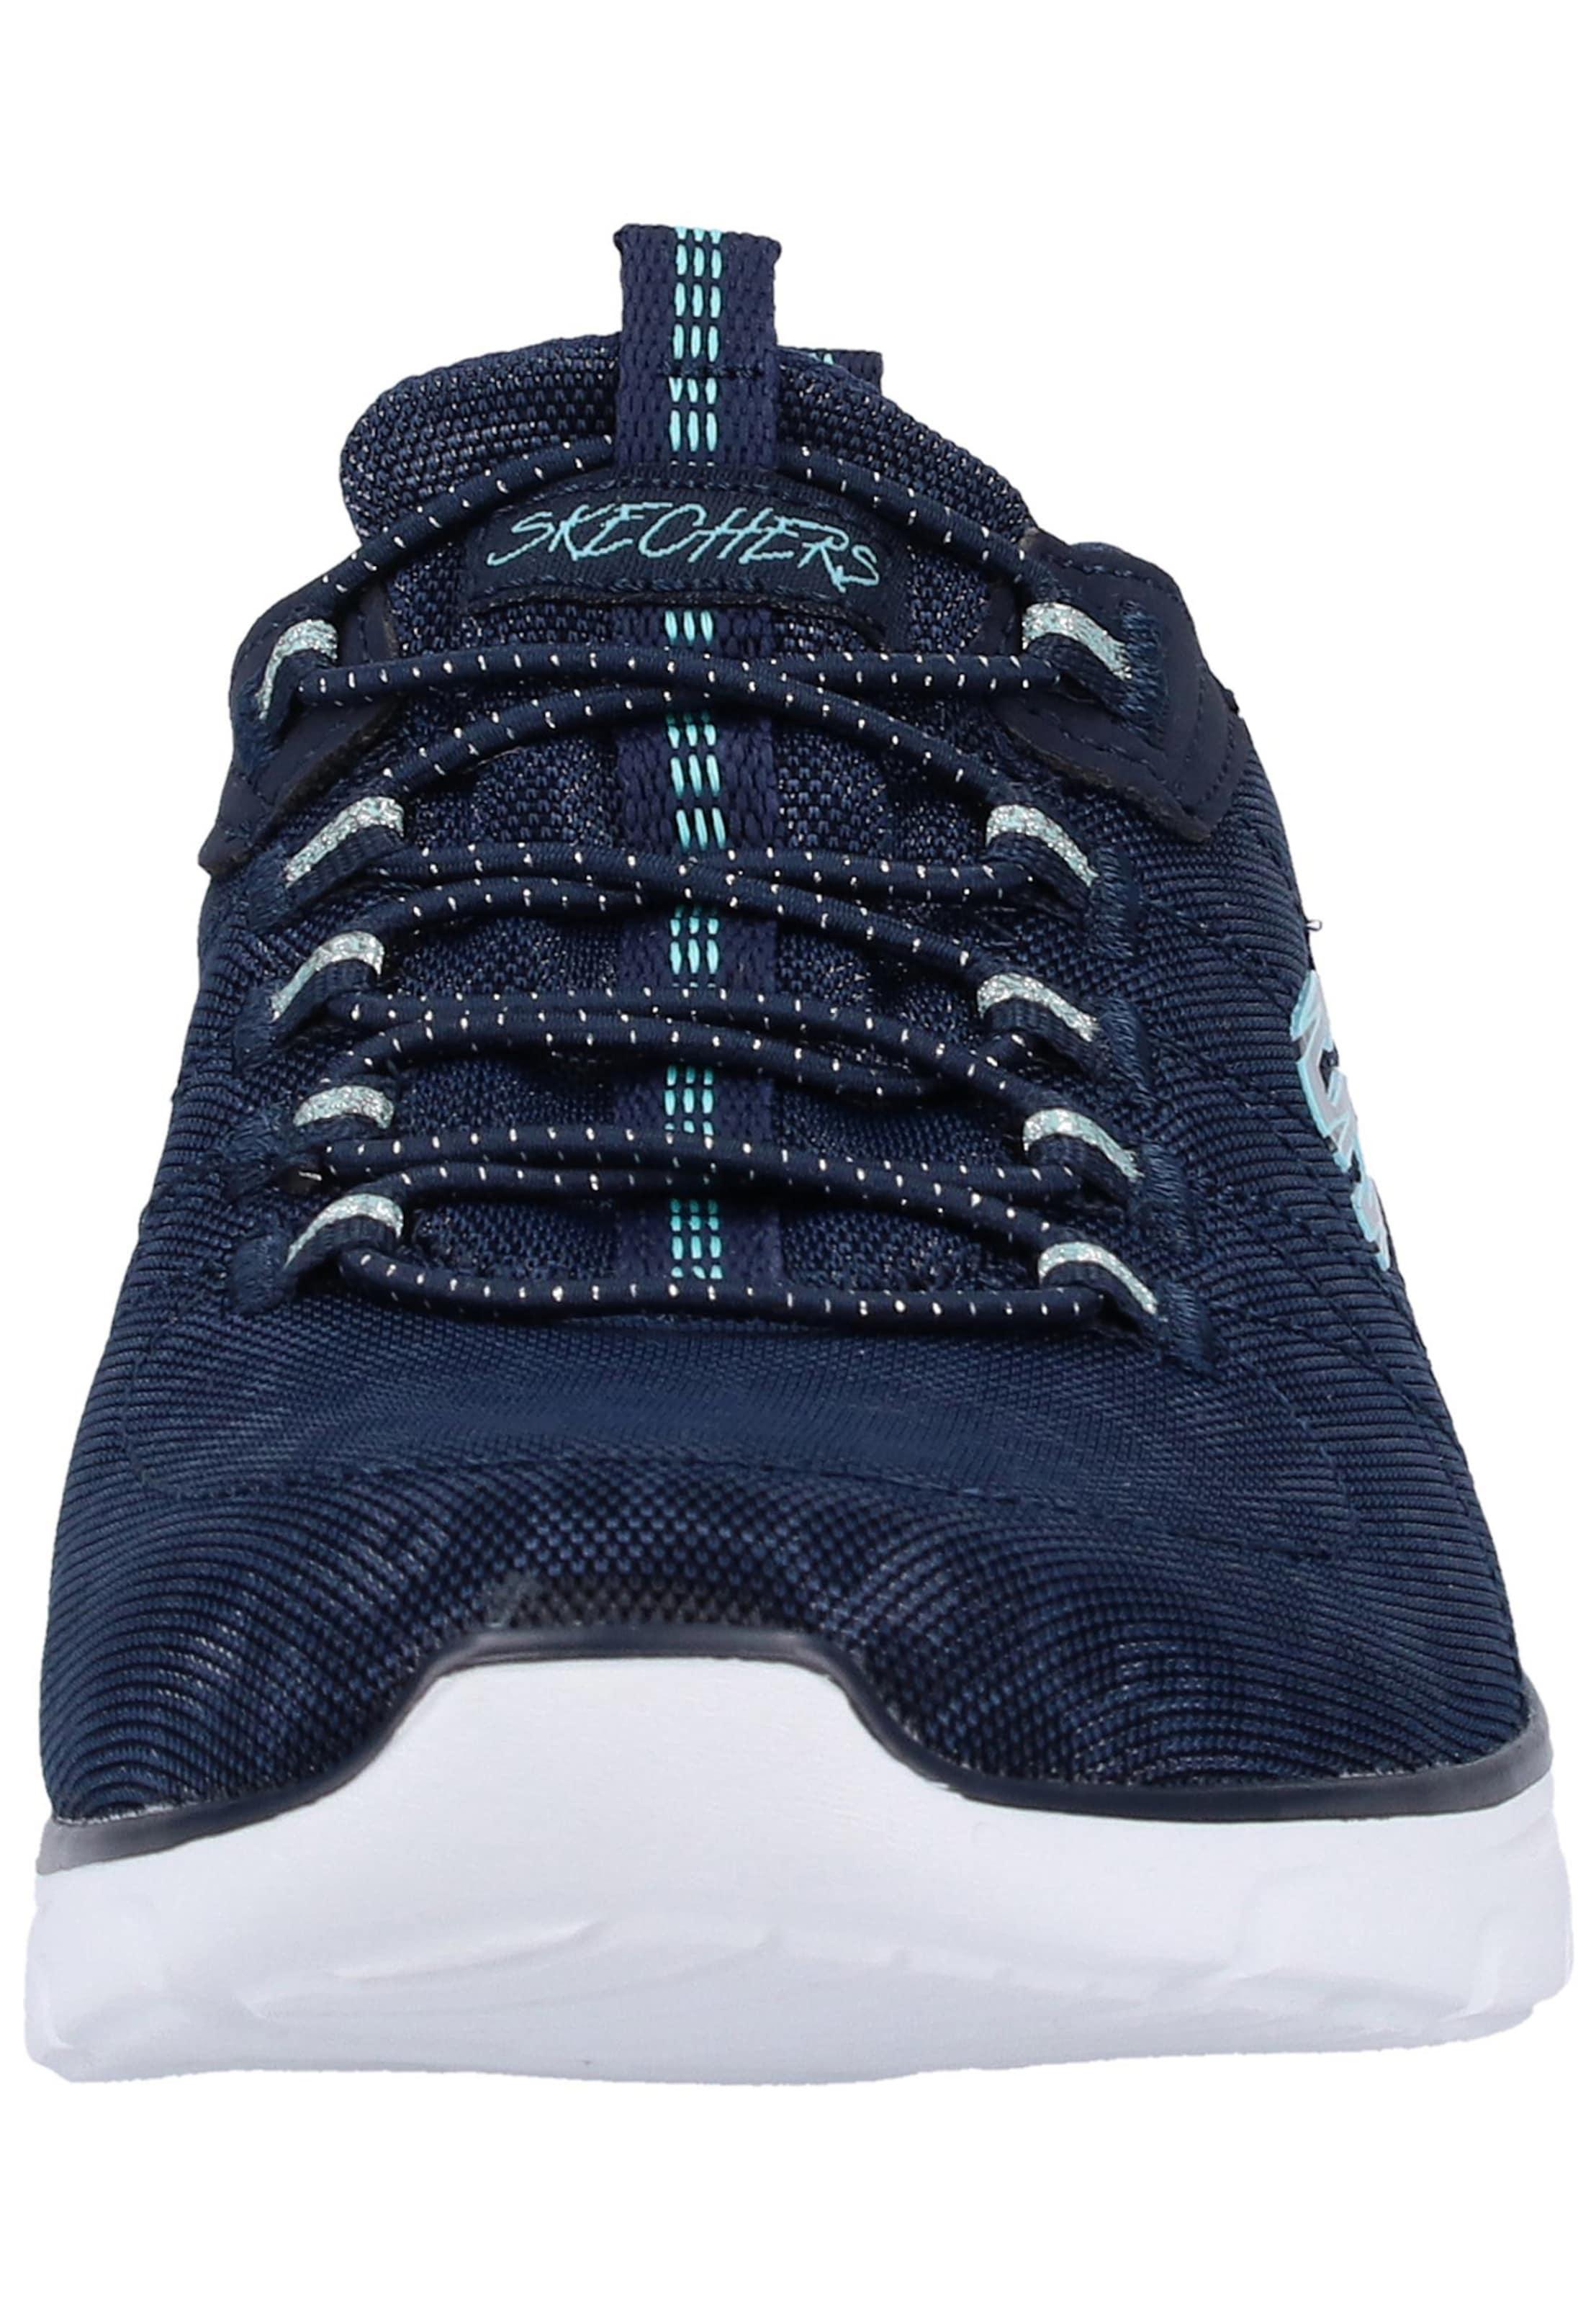 Skechers Baskets D'lux' MarineAqua Basses Bleu 'empire En xrdCBoe